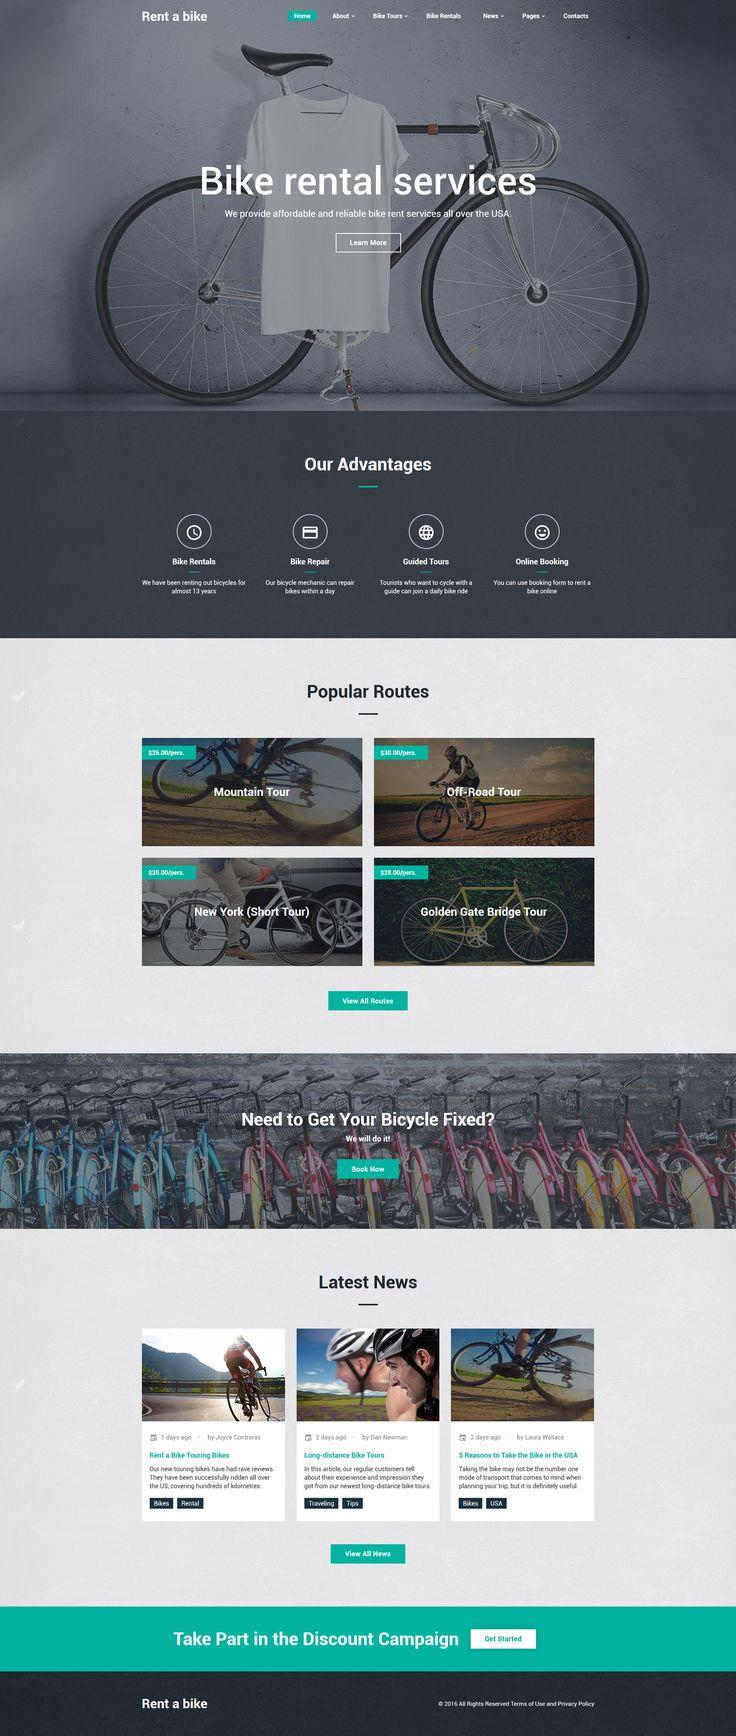 Bike Shop Responsive Website Template - http://www.templatemonster.com/website-templates/bike-shop-responsive-website-template-61188.html